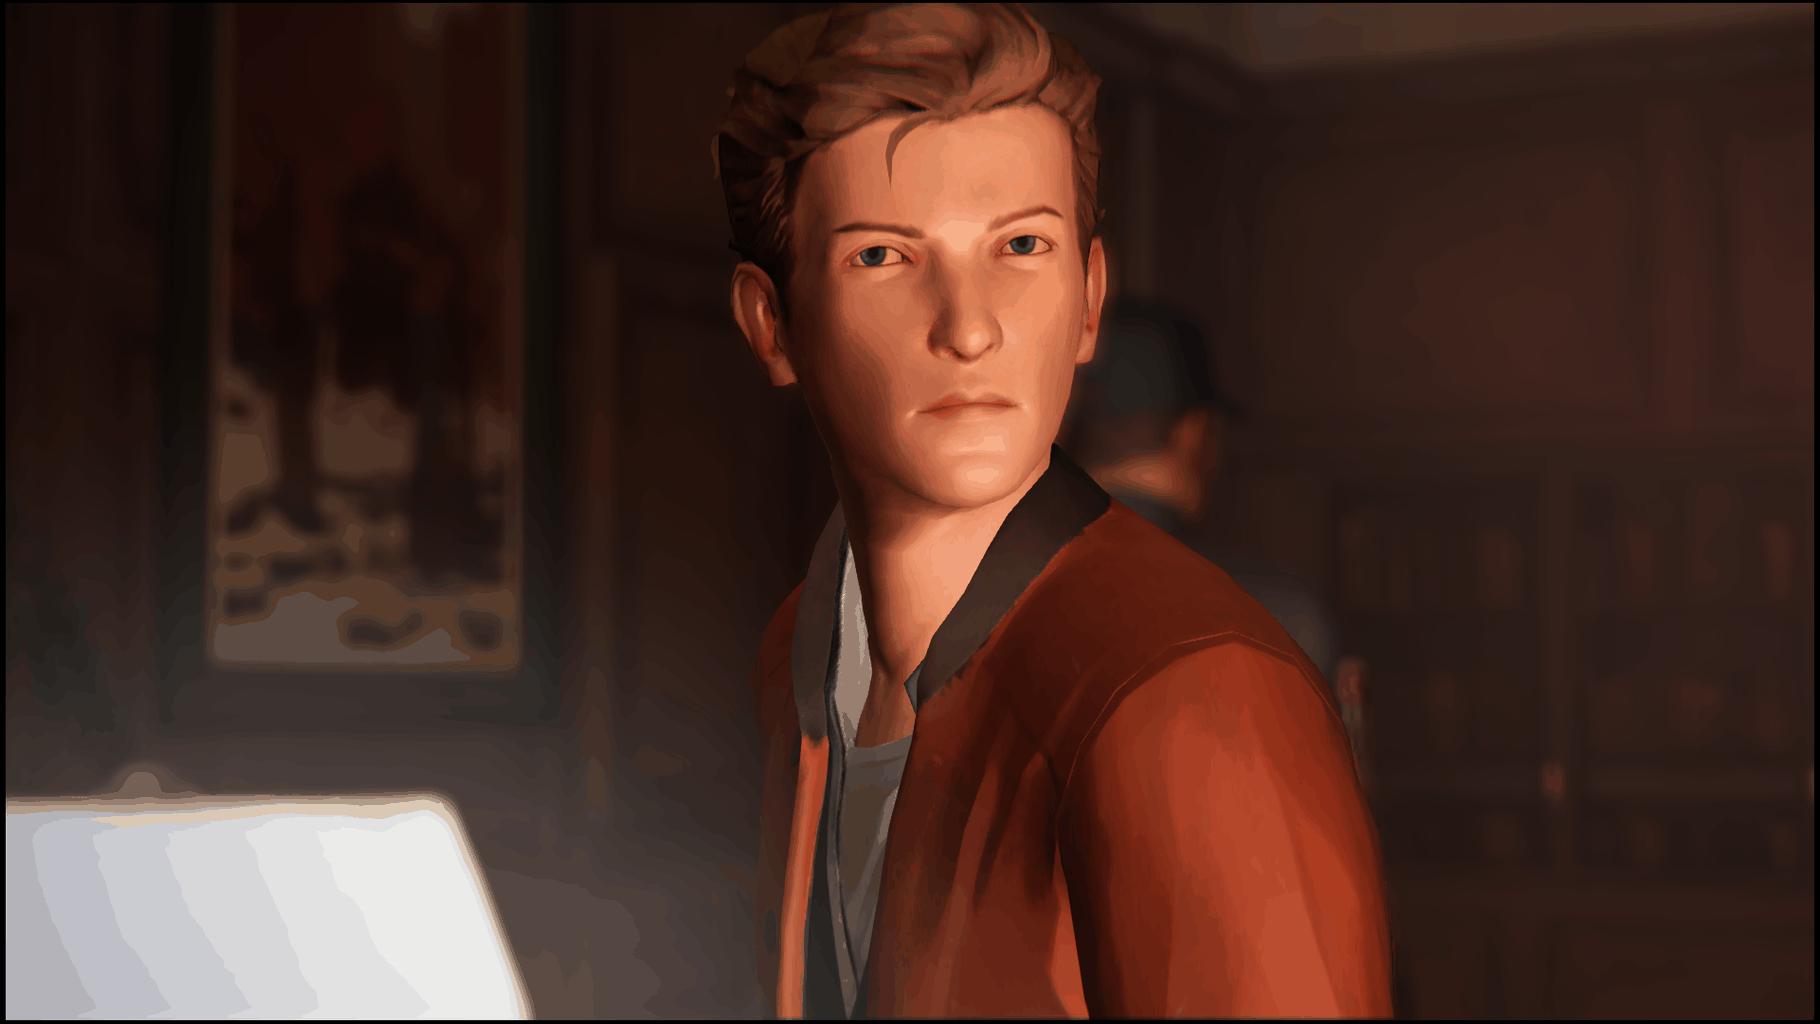 Nathan Prescott from Life is Strange video game